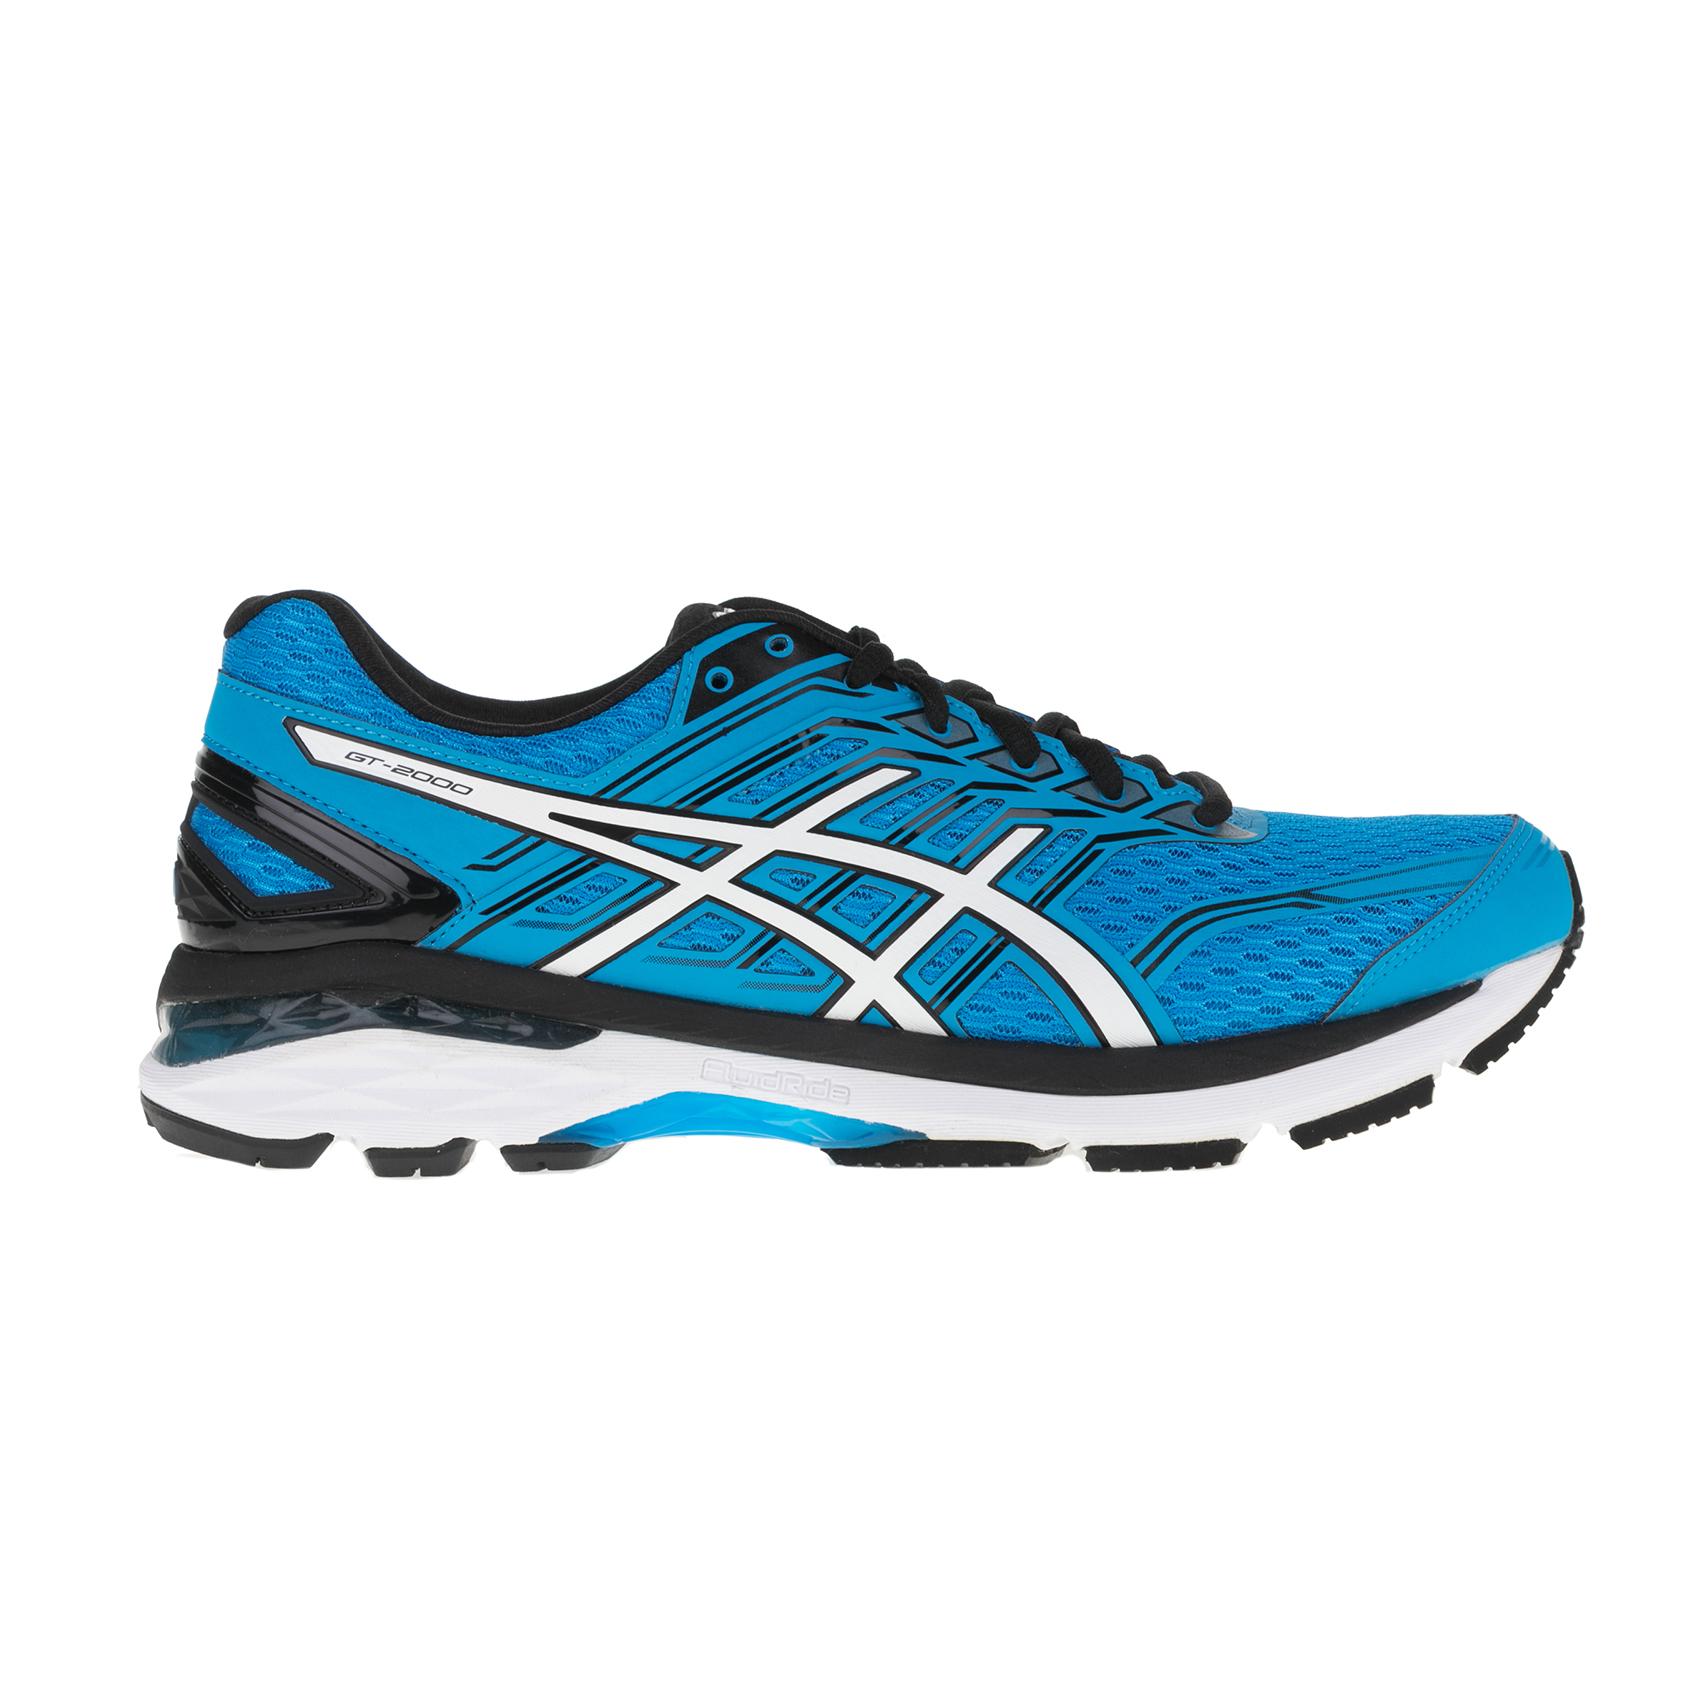 ASICS - Ανδρικά παπούτσια ASICS GT-2000 5 μπλε ανδρικά παπούτσια αθλητικά running